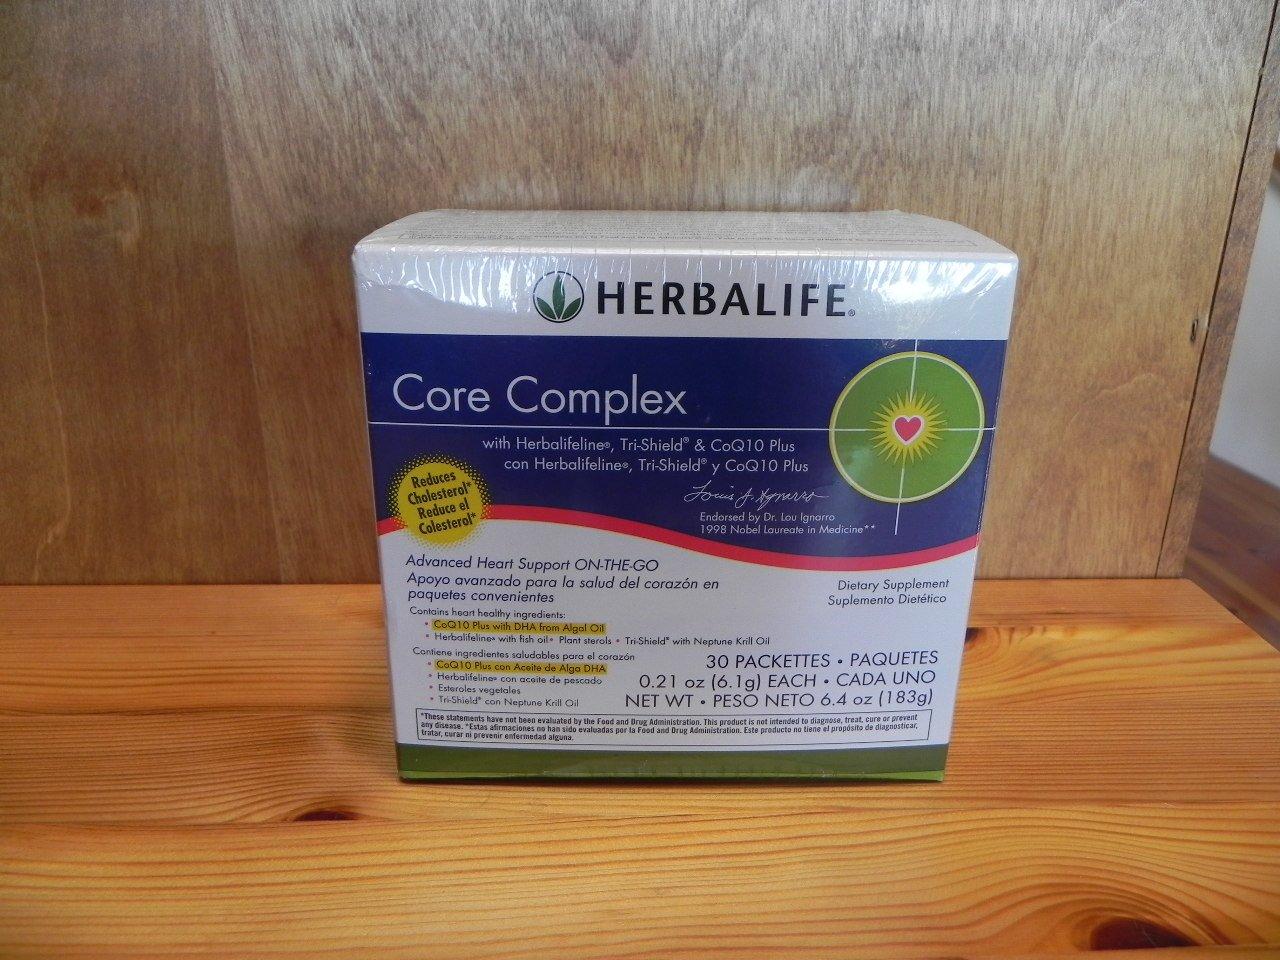 Herbalife Core Complex with Herbalifeline, Tri-Shield Tri Shield, & CoQ10 Plus Box 2011